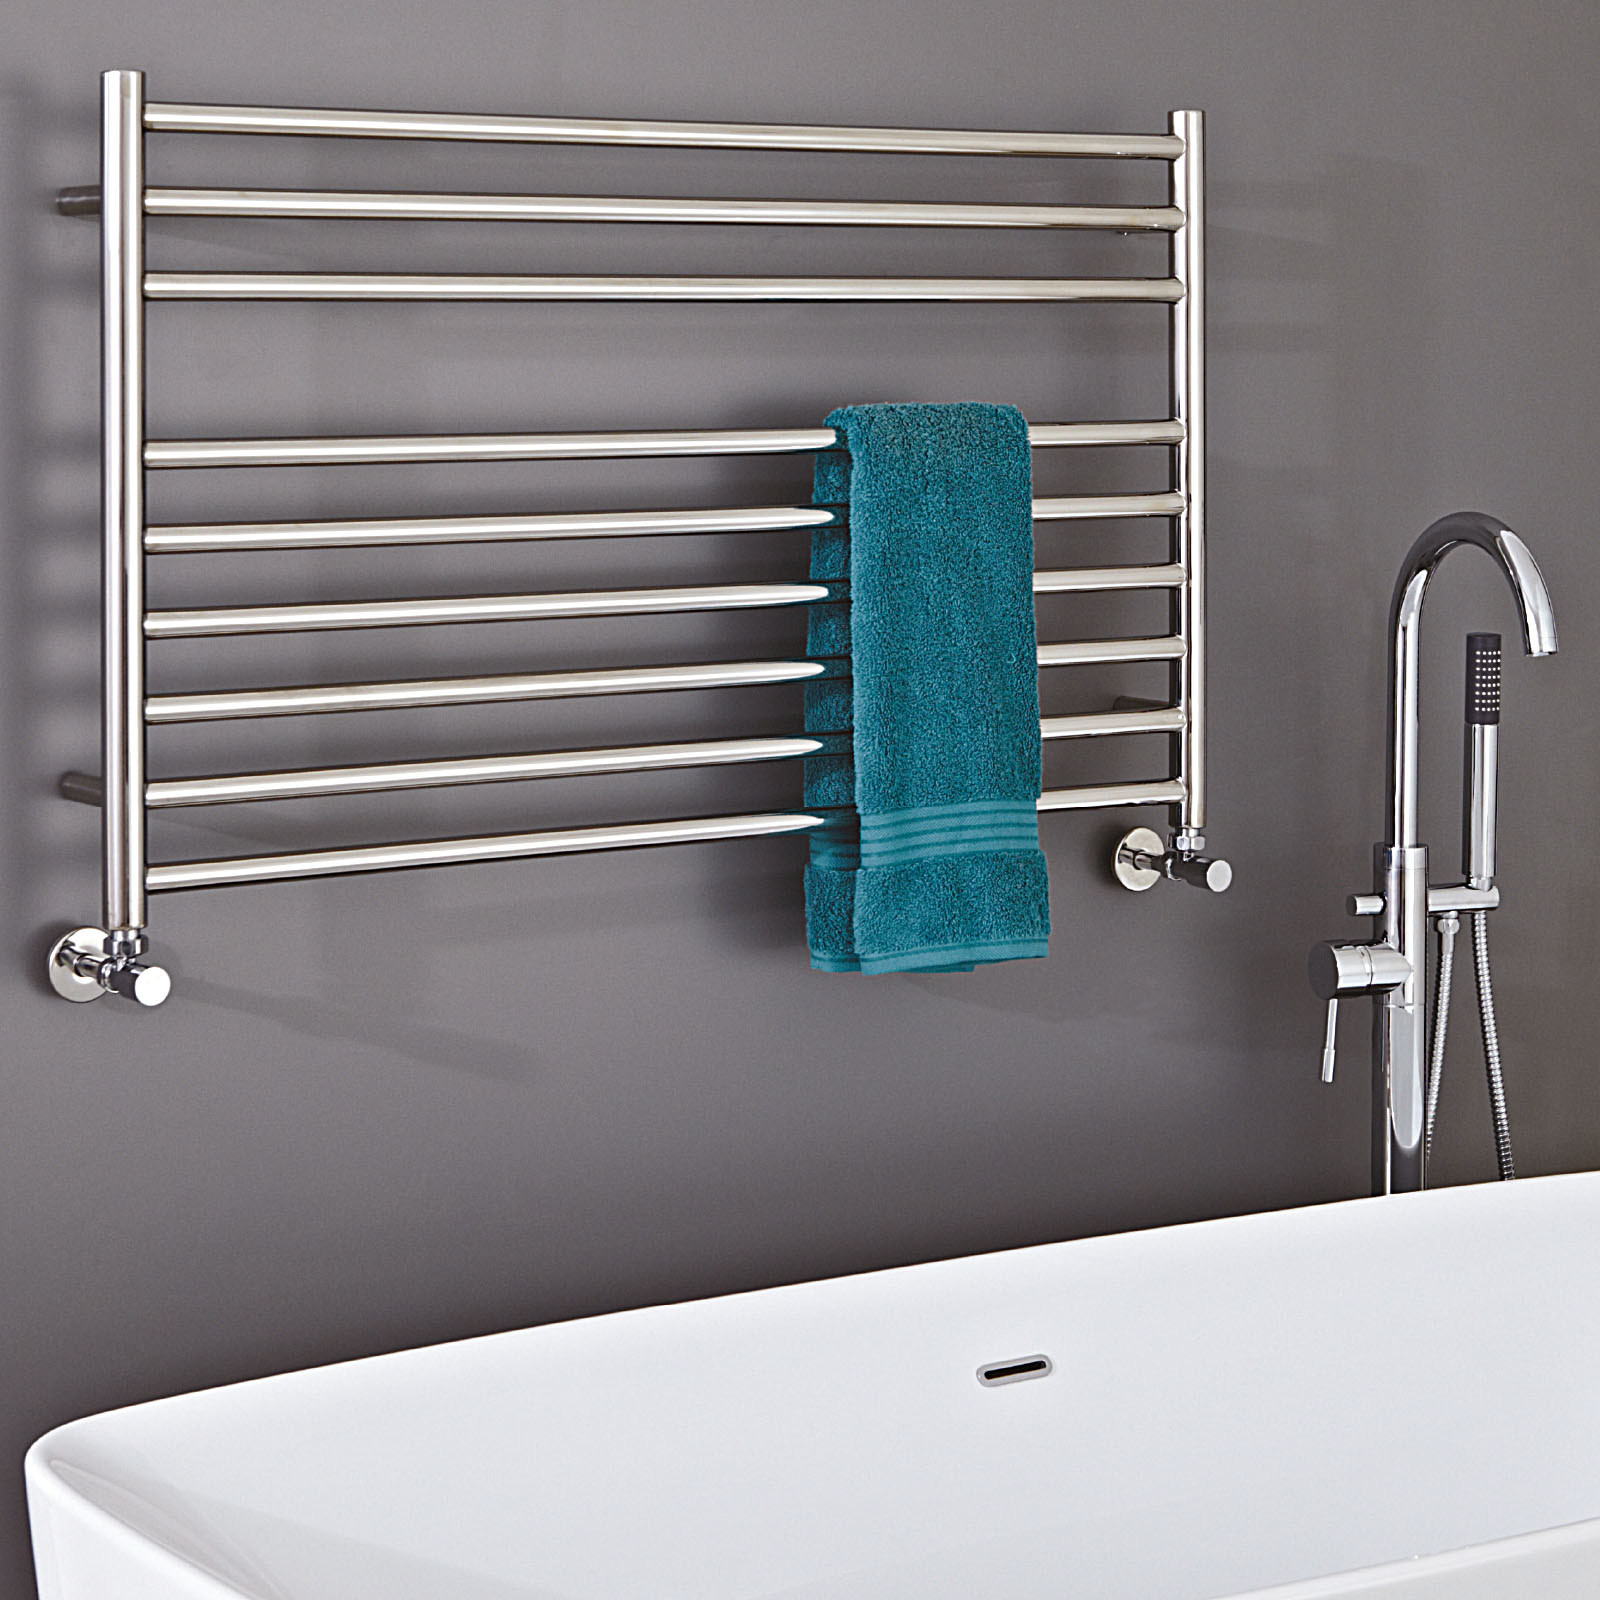 Zonta Wall Mounted Stainless Steel Towel Radiator